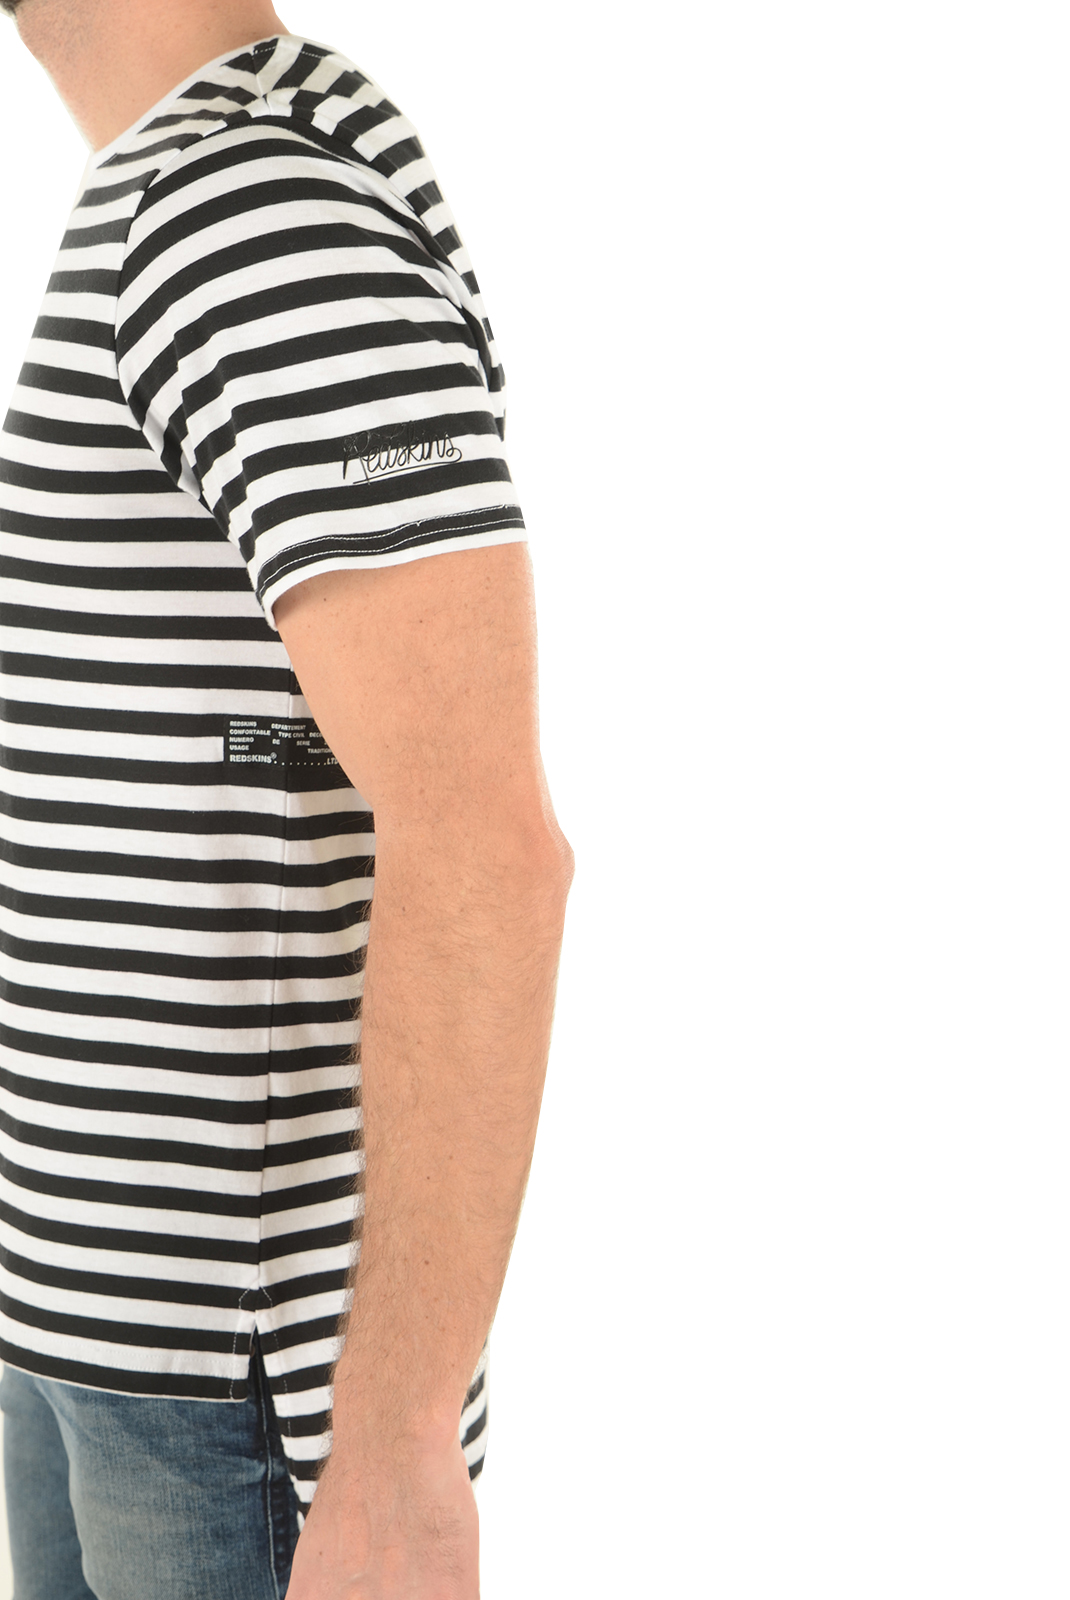 Tee-shirts  Redskins HADES CERES BLACK WHITE